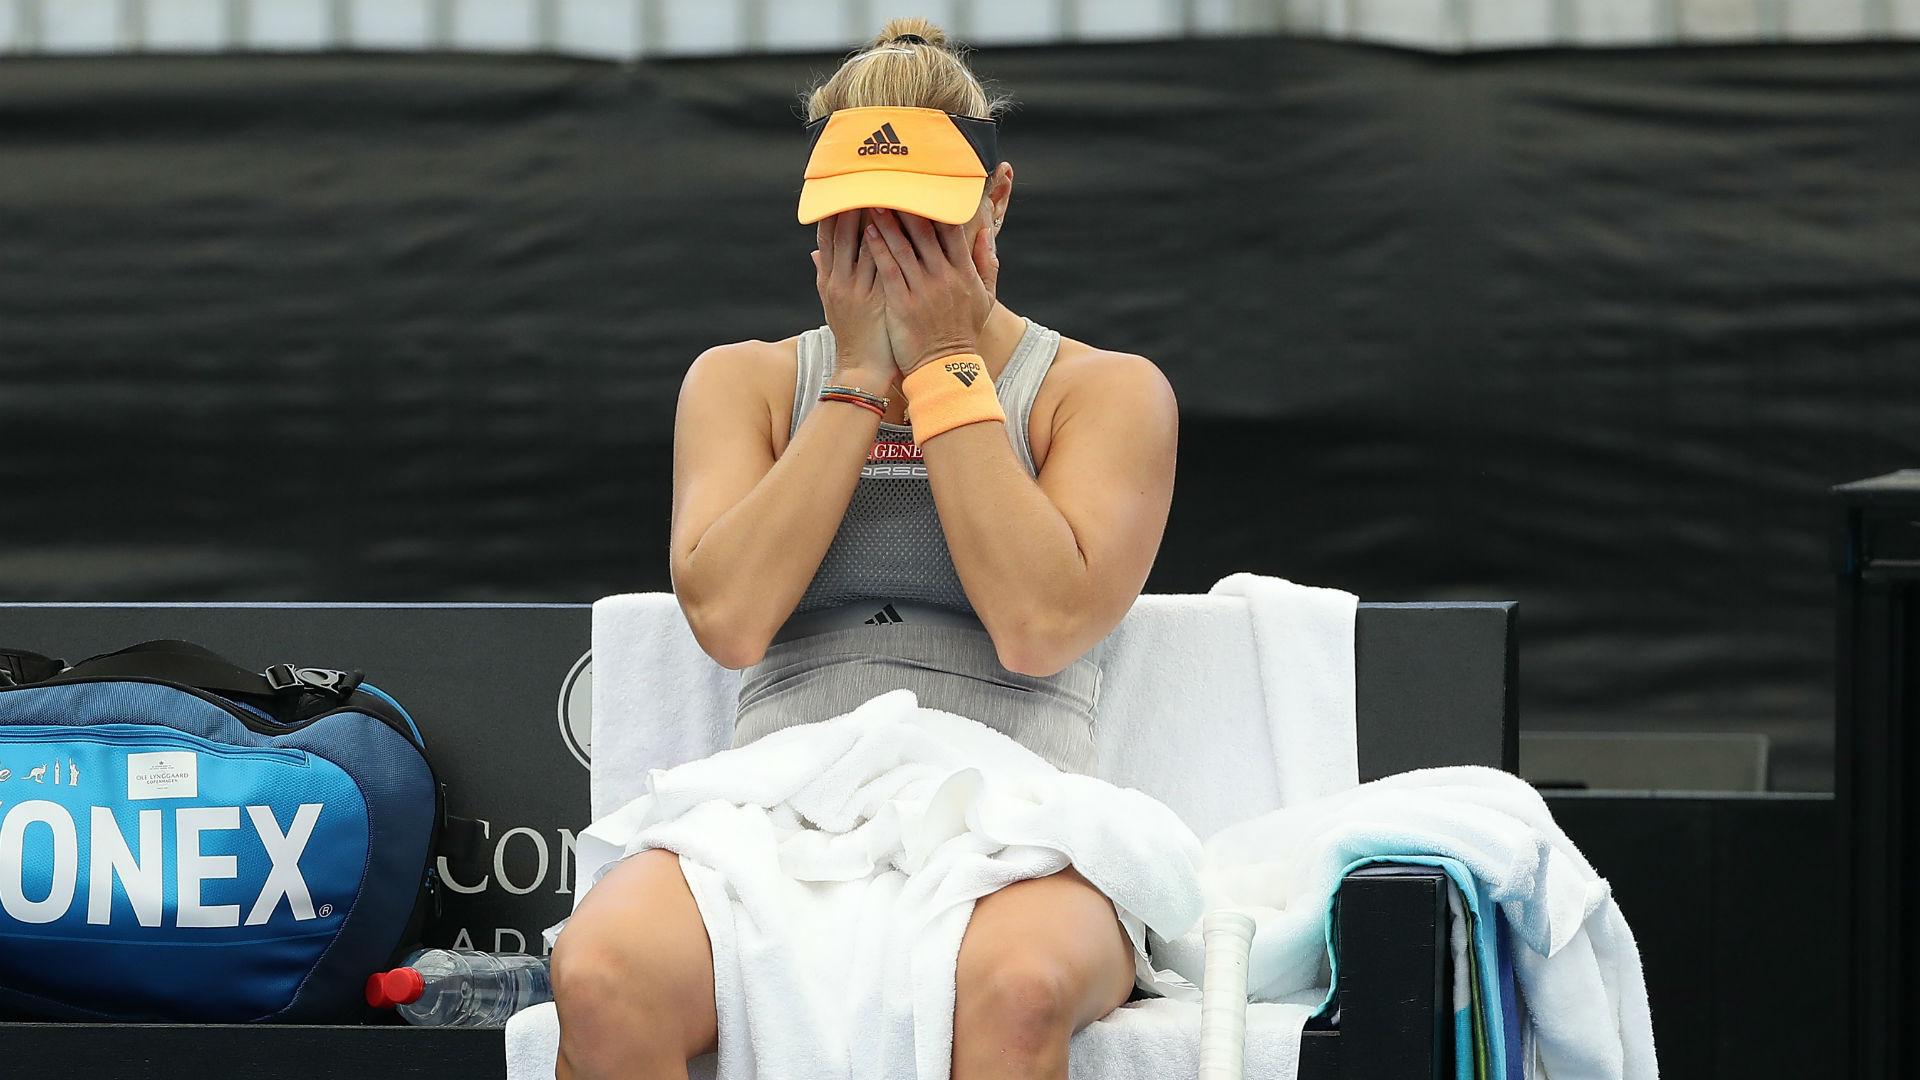 Kerber suffers pre-Australian Open injury scare, Vondrousova eyes Barty revenge